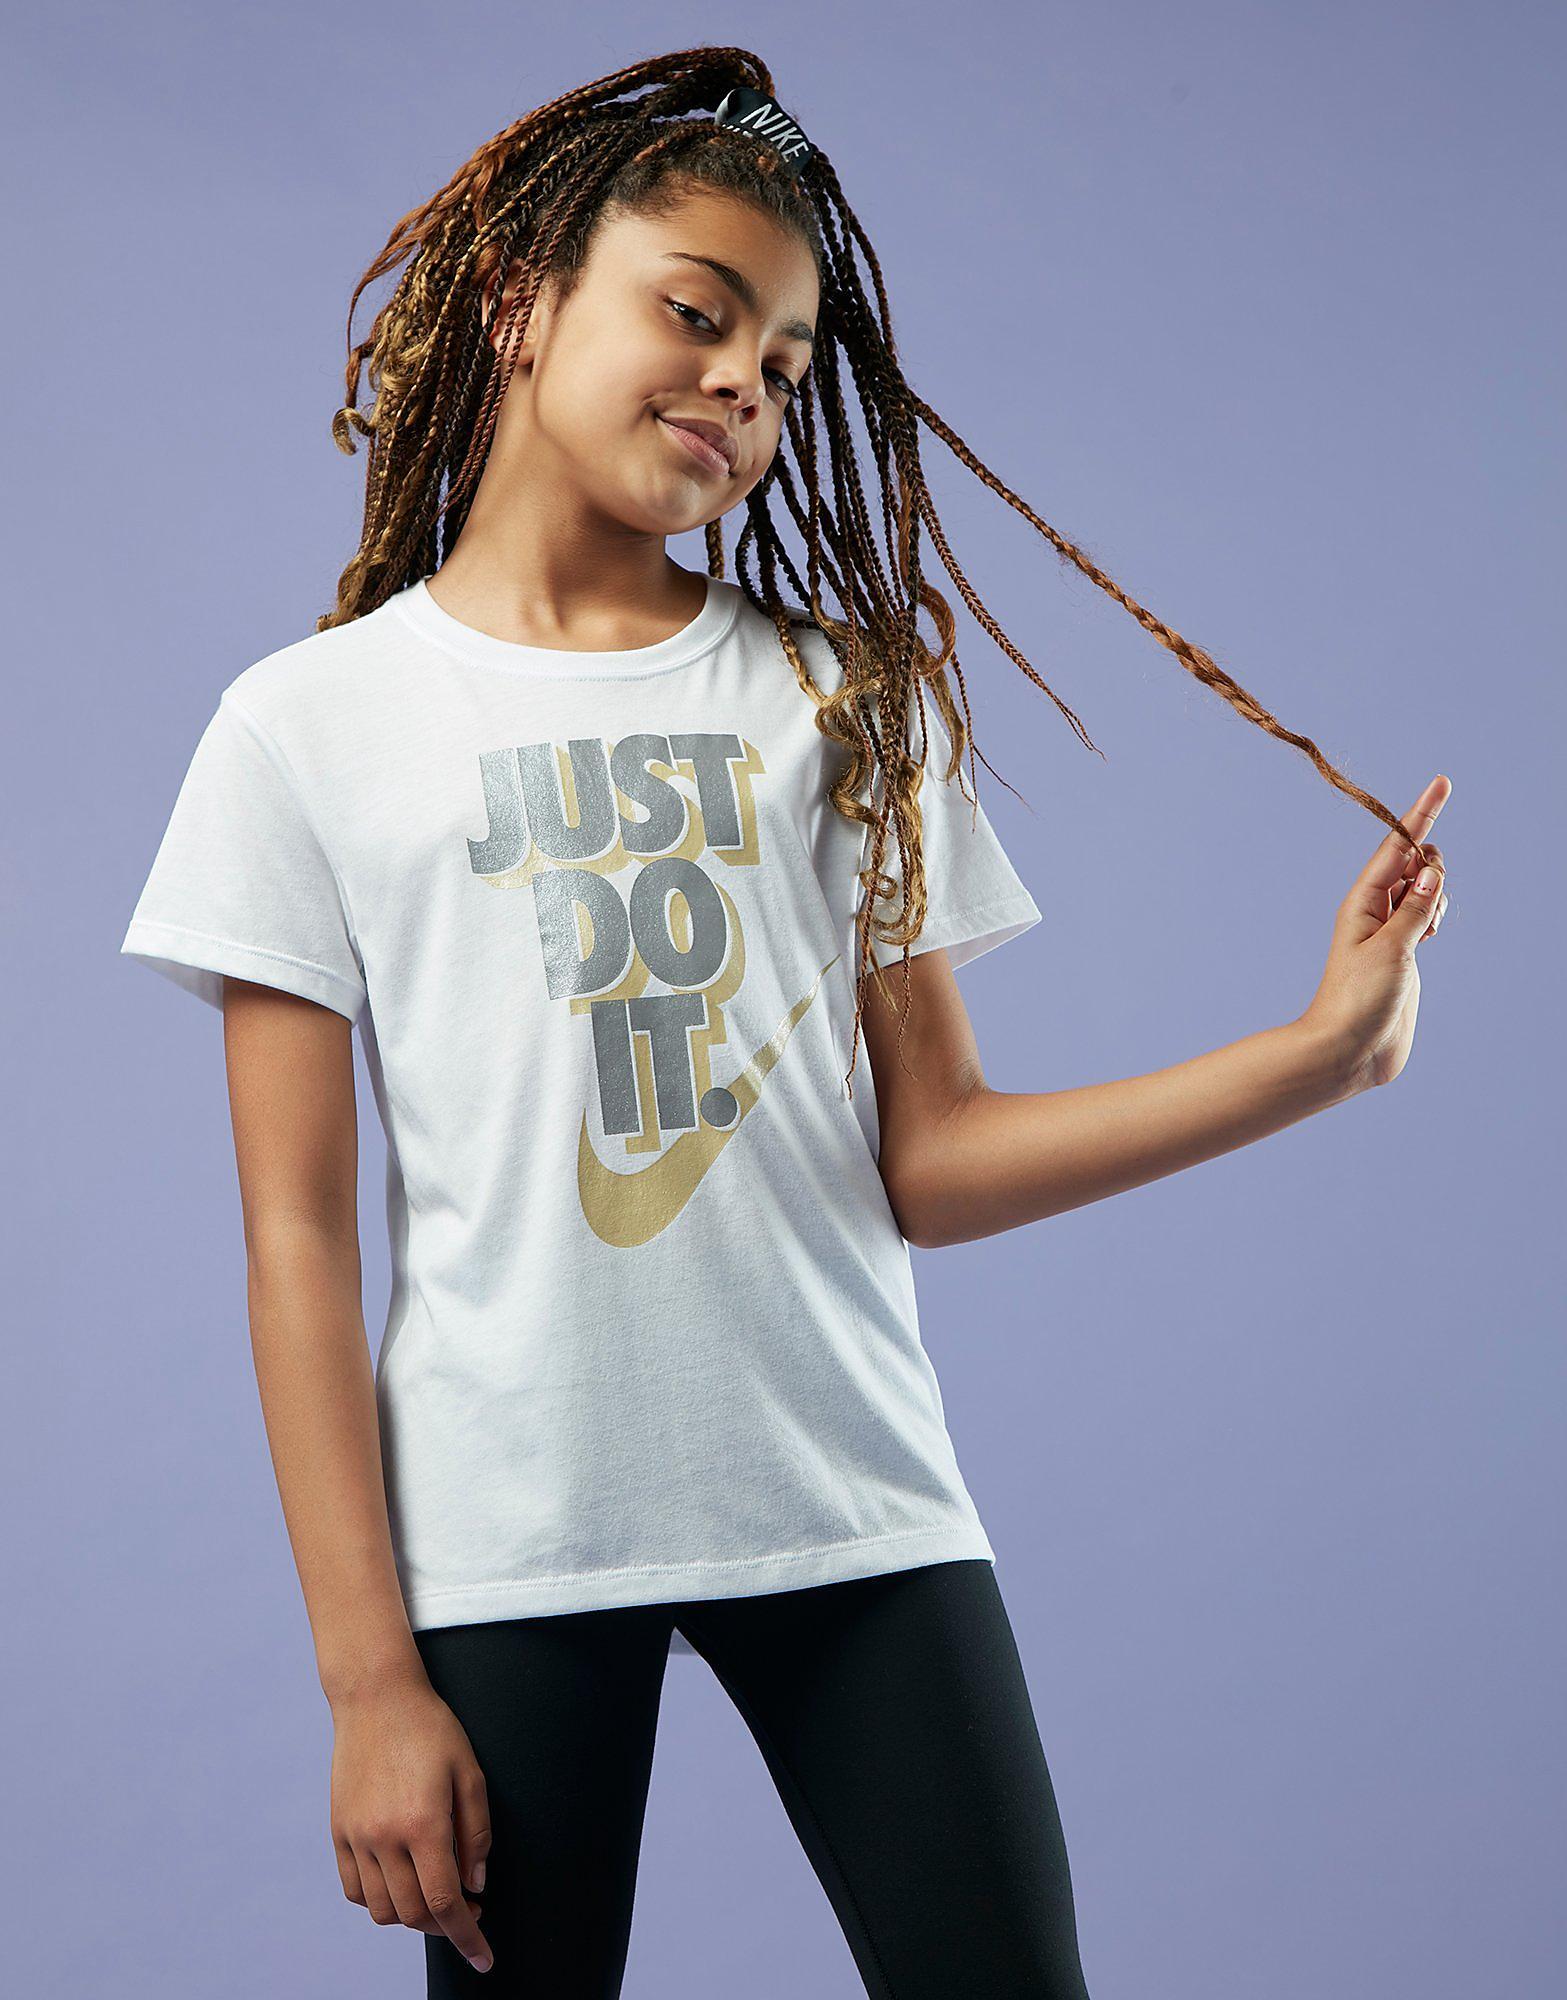 Nike Girls' Stack Just Do It T-Shirt Junior